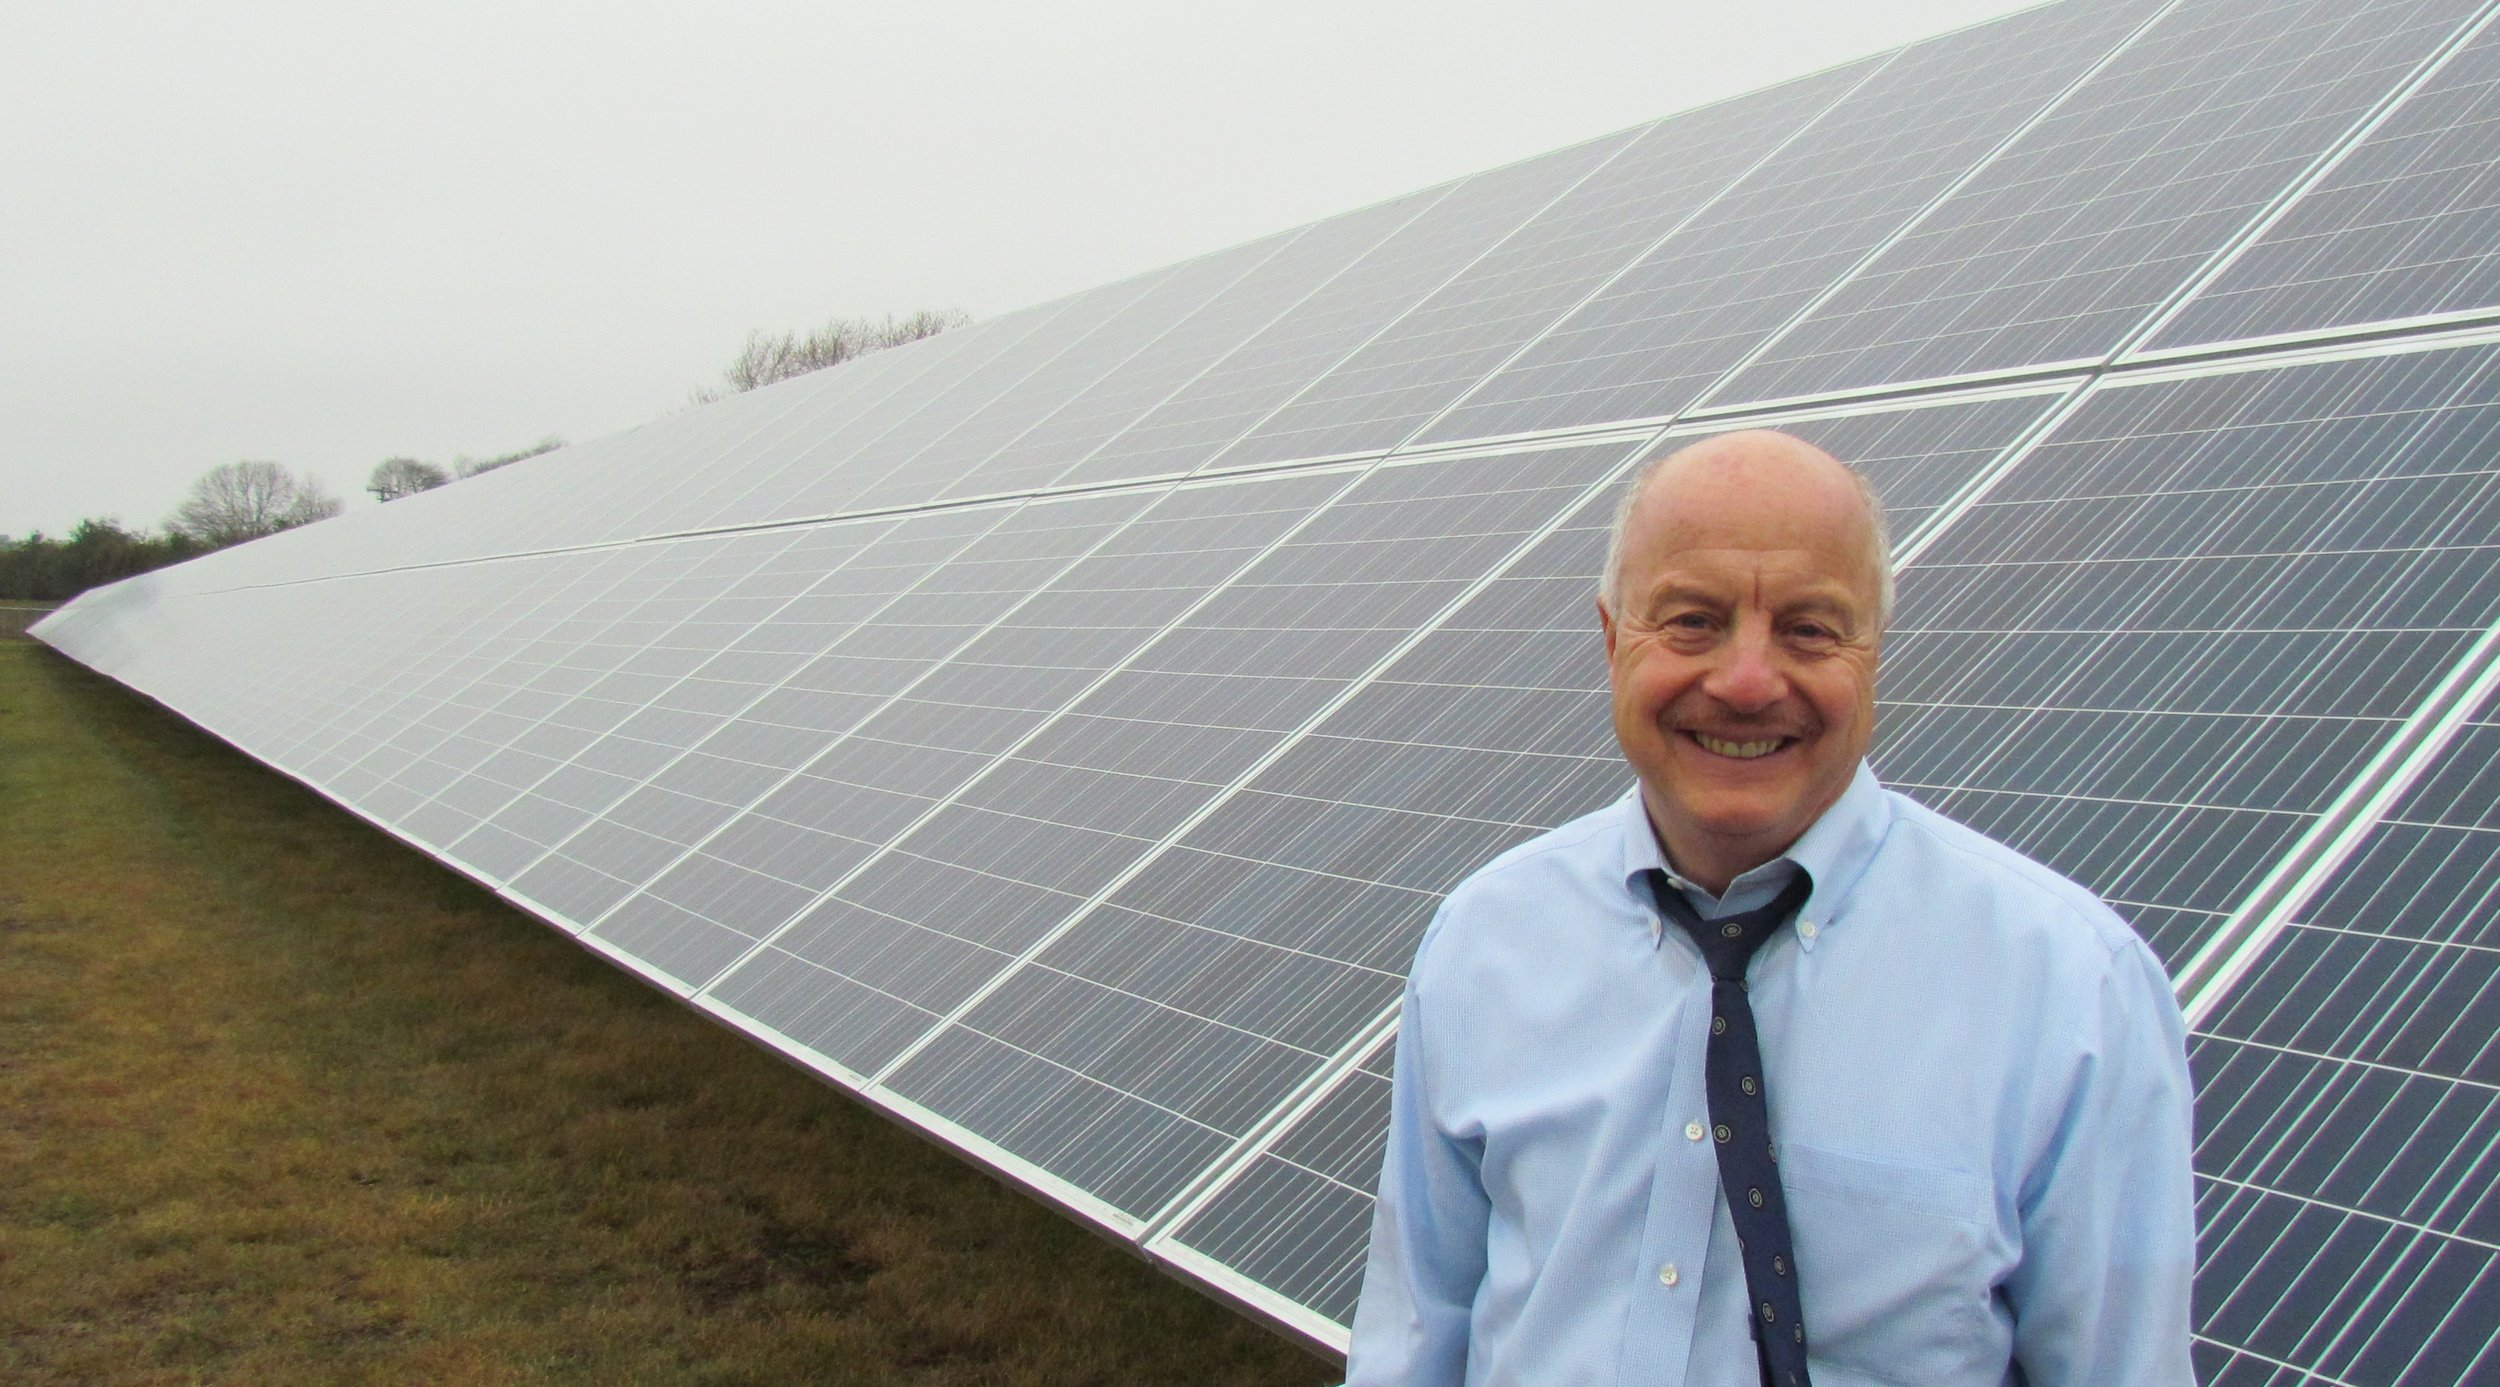 Frank Epps of Energy Development Partners is building more solar arrays in Rhode island (Tim Faulkner/ecoRI News)